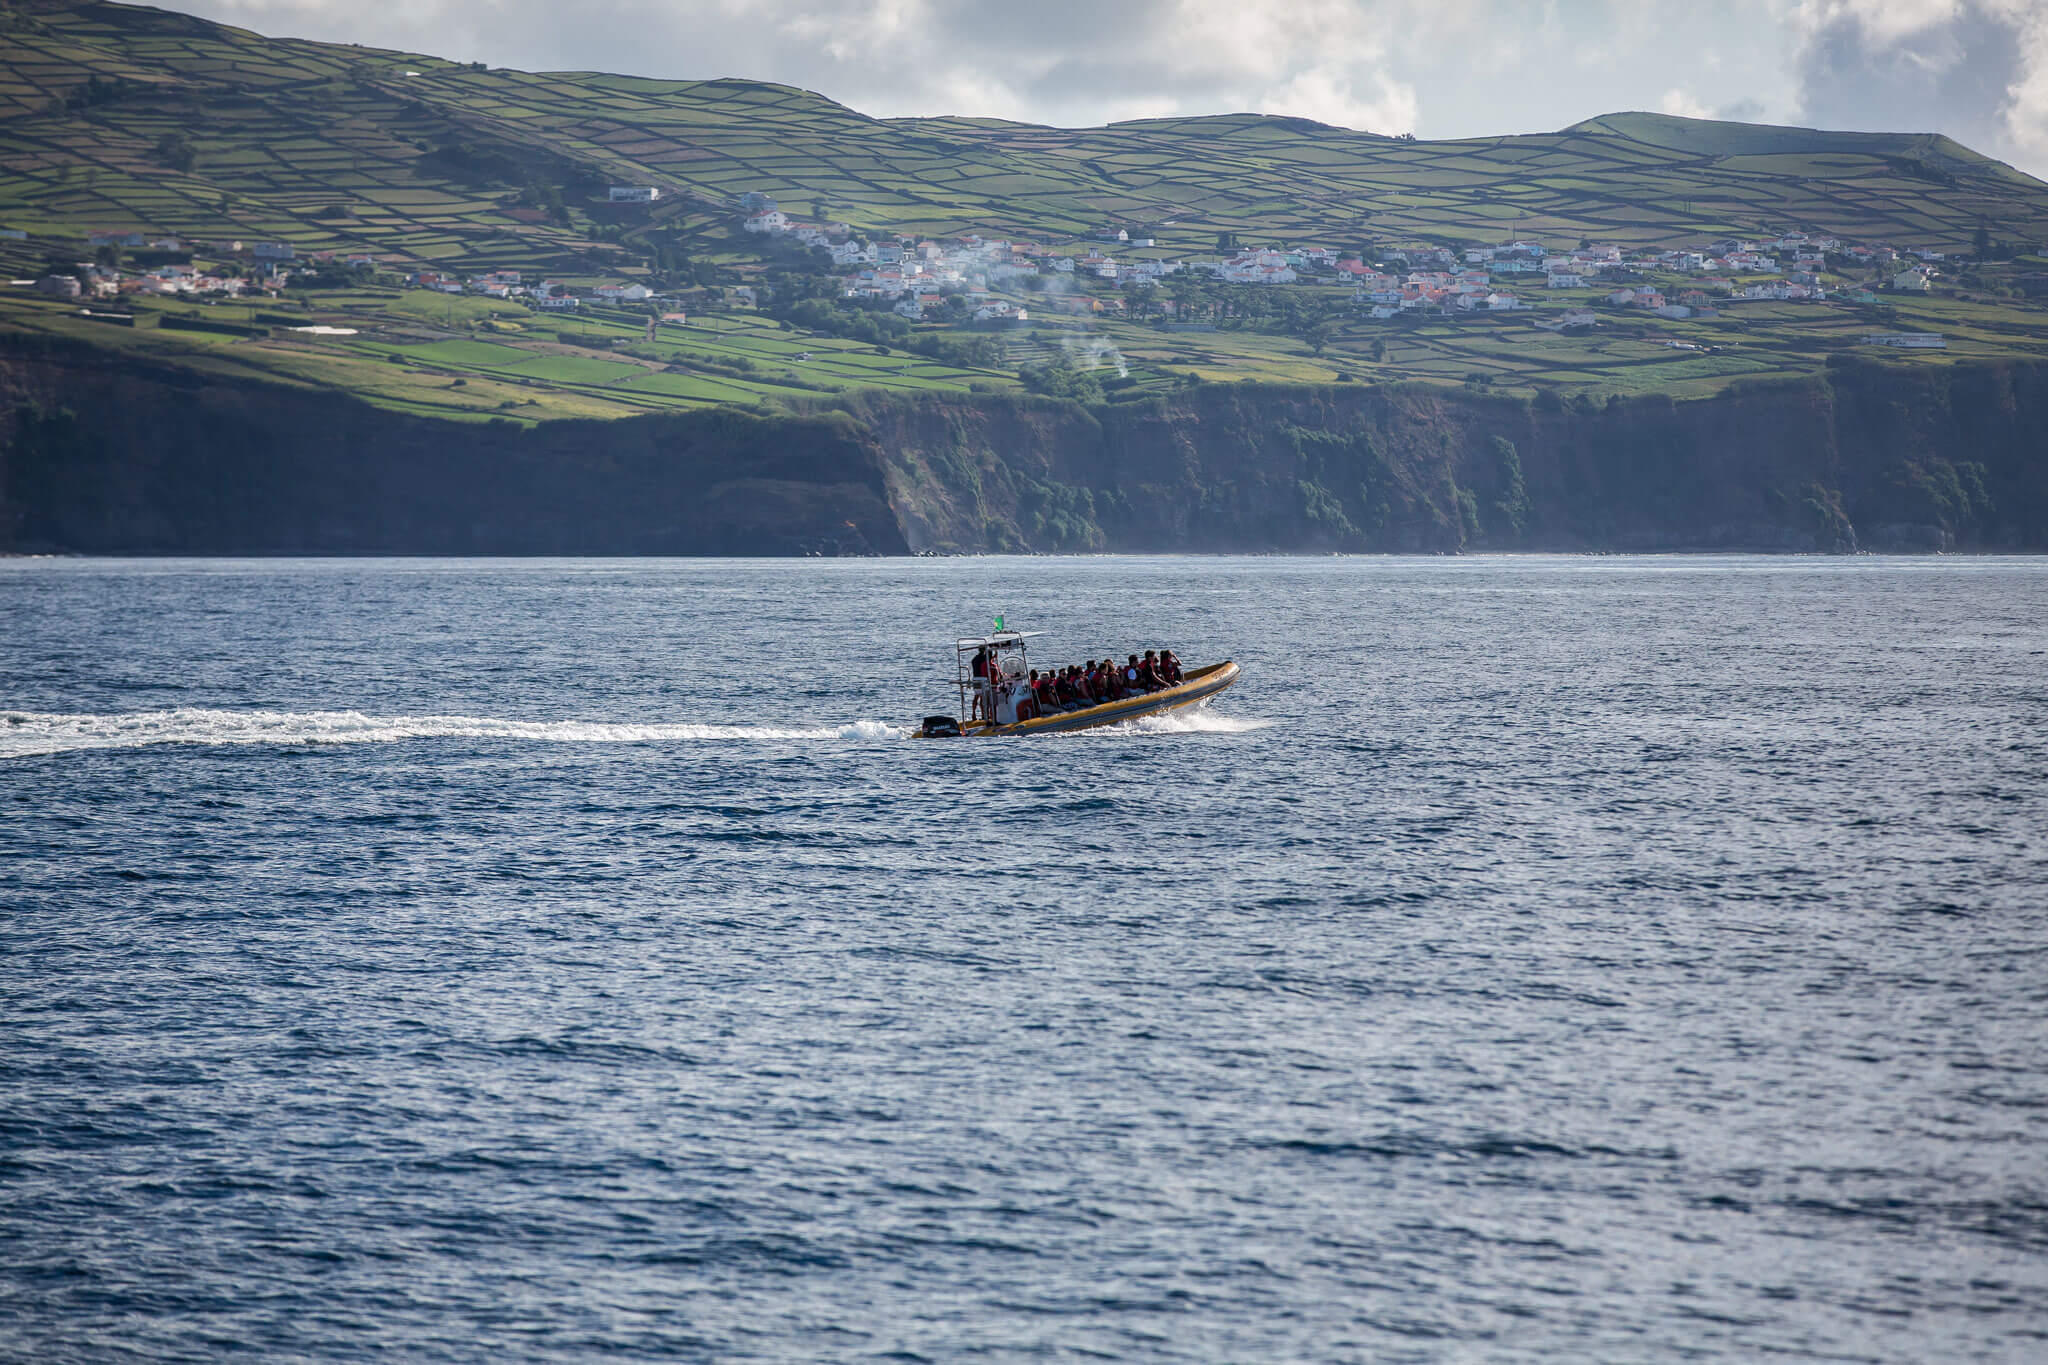 experiencias-mar-passeios-barco-explore-terceira-2